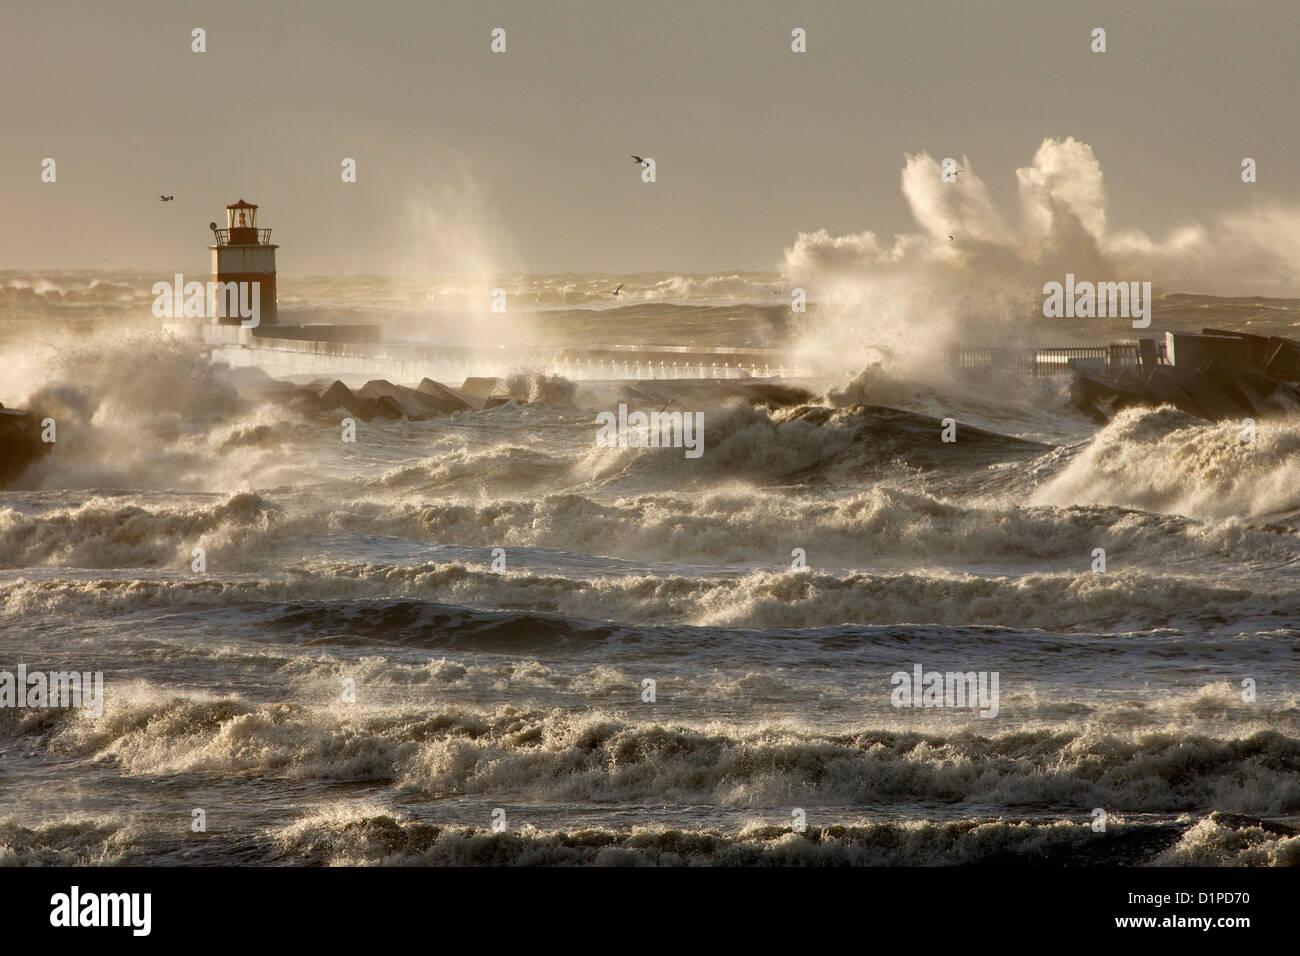 The Netherlands, IJmuiden, Storm. Waves smash against lighthouse or beacon. - Stock Image